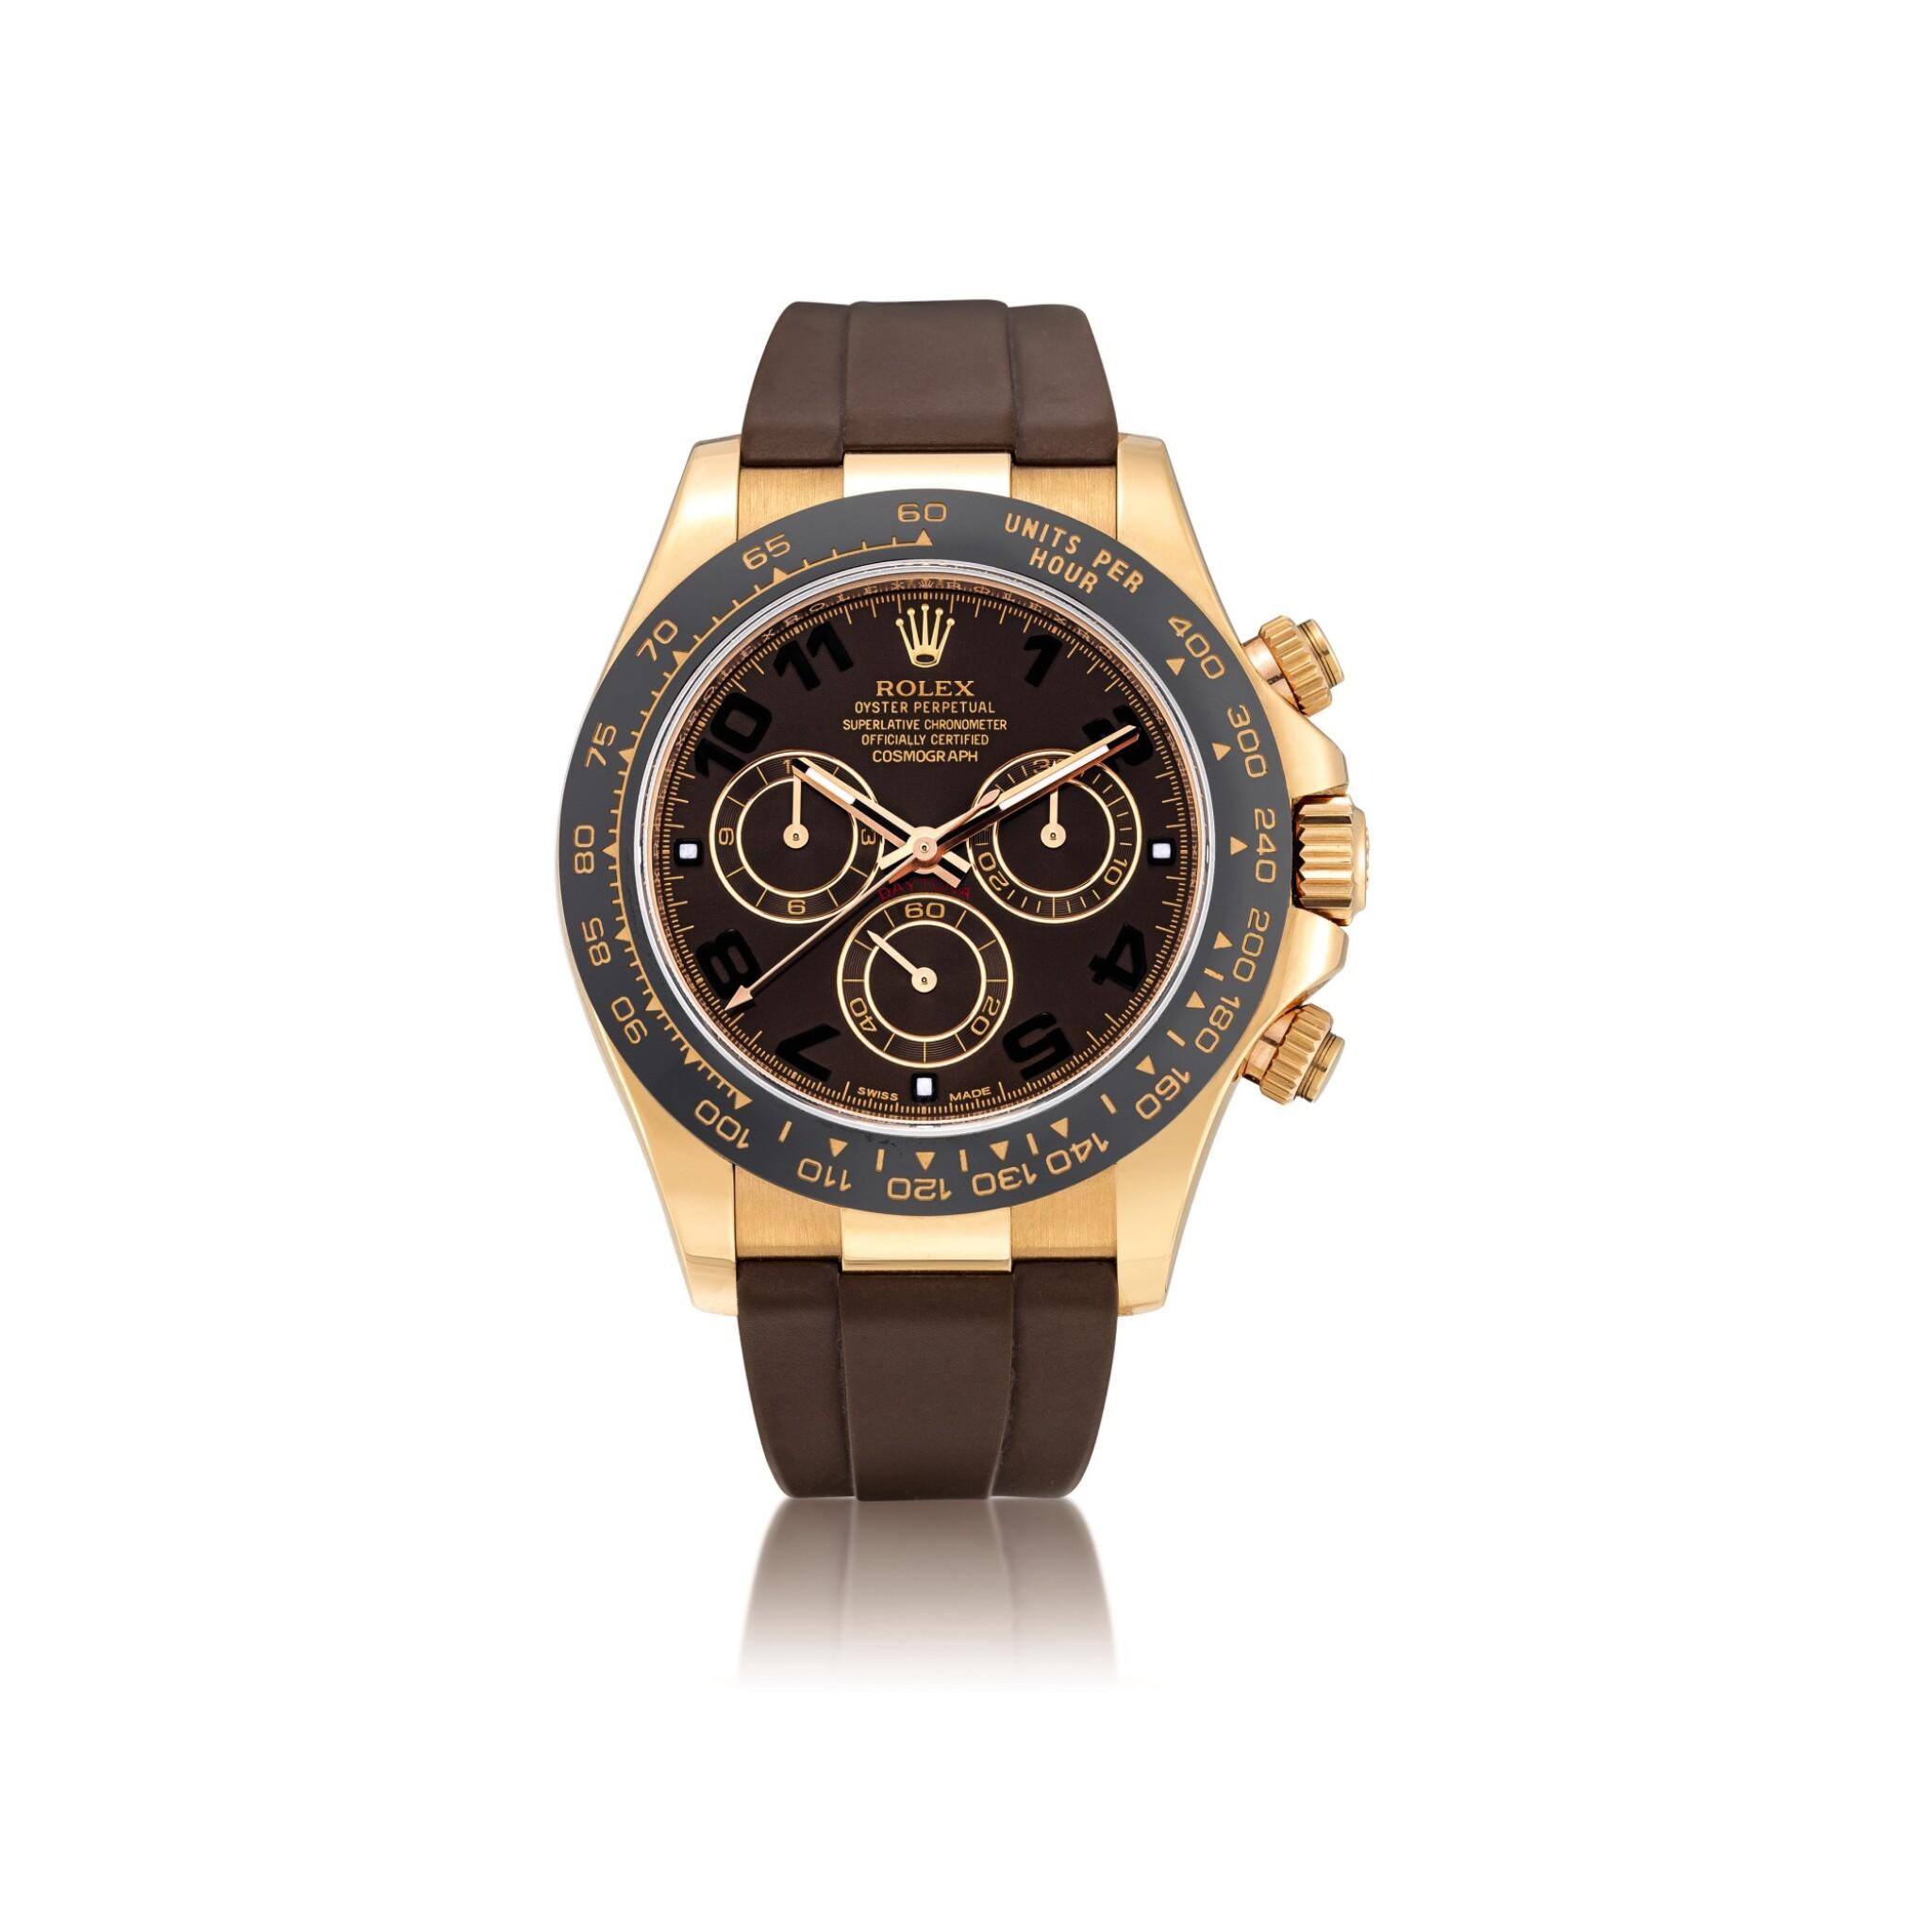 View full screen - View 1 of Lot 2010. Rolex | Cosmograph Daytona, Reference 116515LN, An Everose gold chronograph wristwatch, Circa 2015 | 勞力士 | Cosmograph Daytona 型號116515LN  永恆玫瑰金計時腕錶,約2015年製.